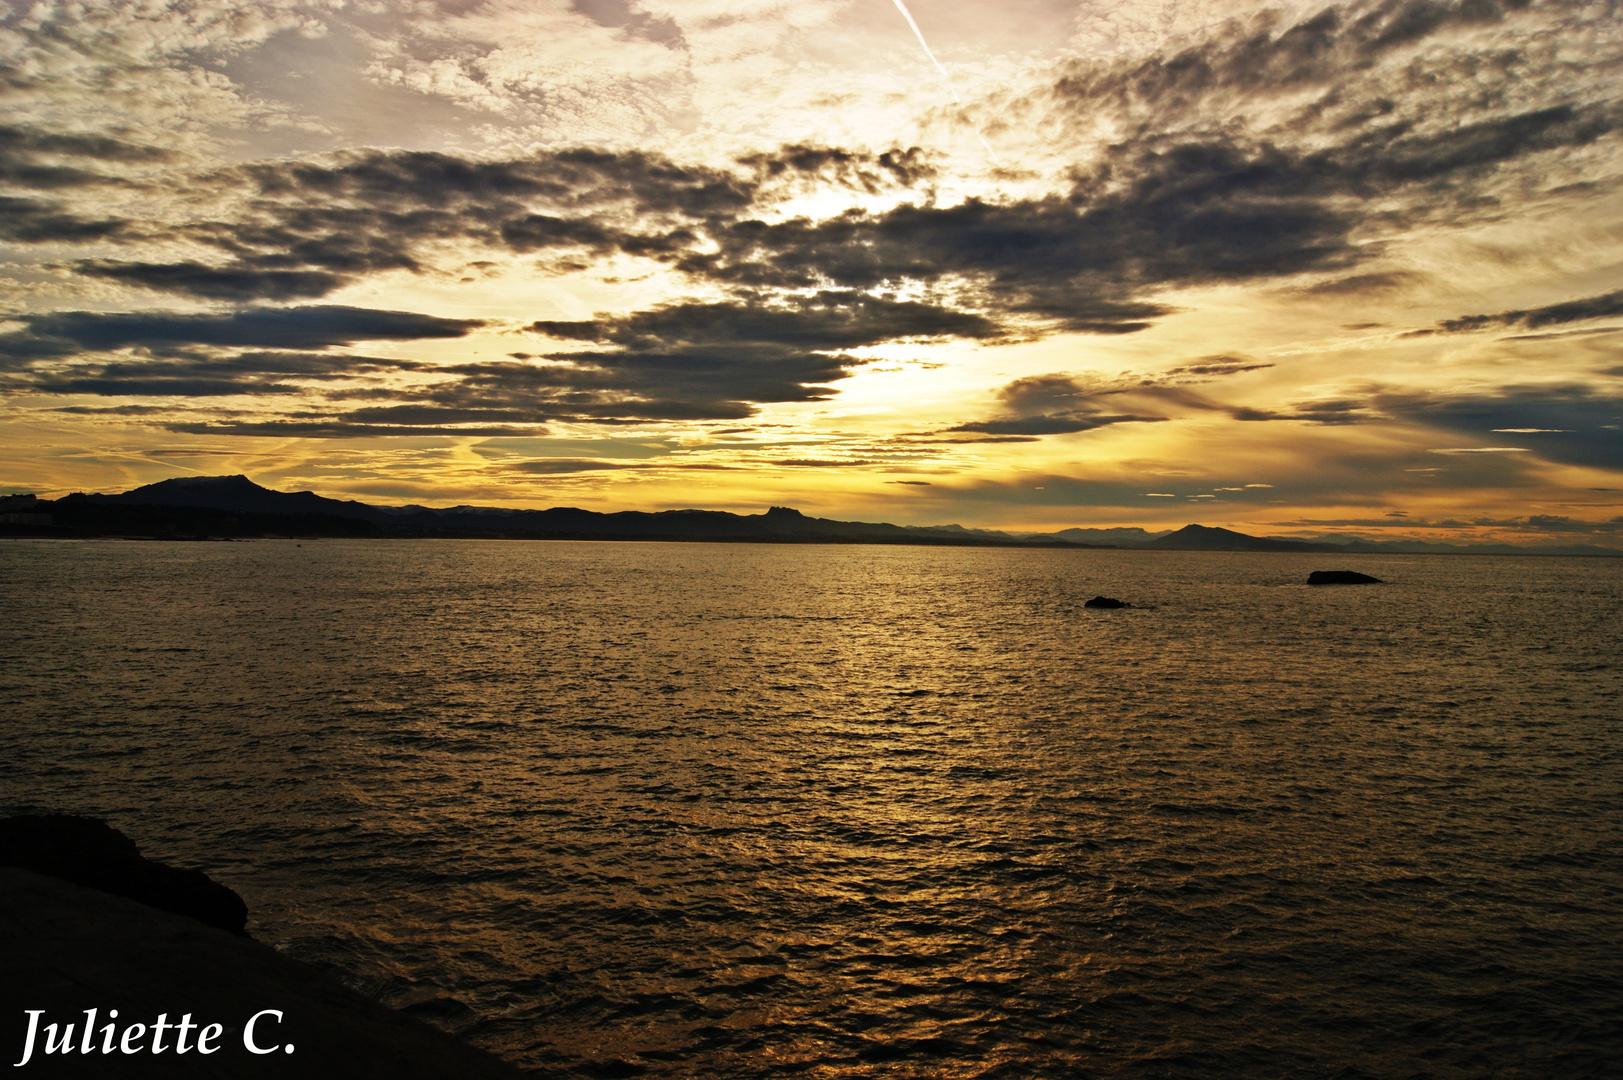 Coucher de soleil à Biarritz